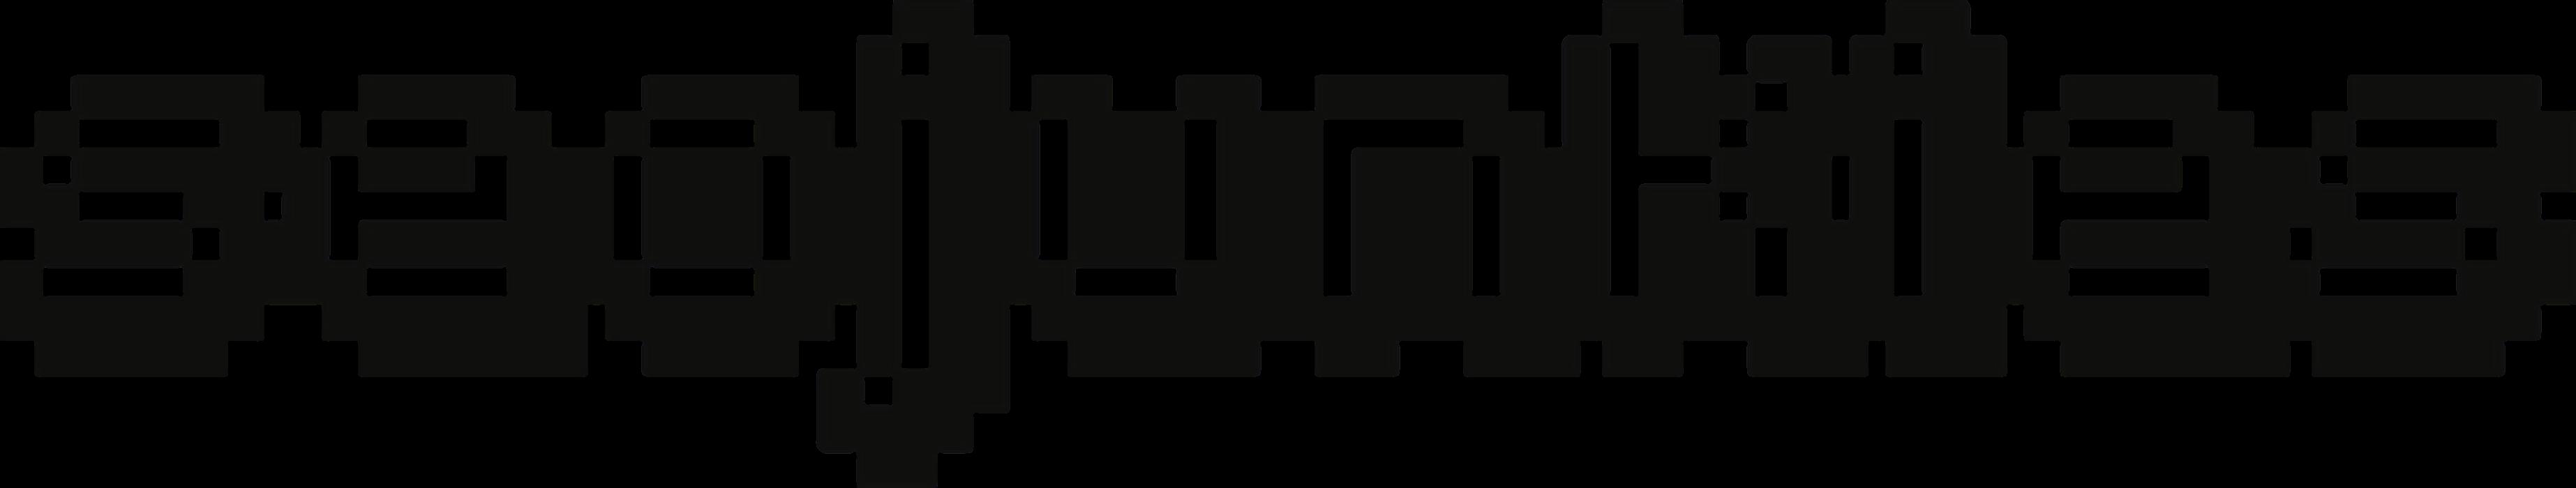 seojunkies - Suchmaschinenoptimierung (SEO) und Suchmaschinenwerbung (SEA) in Gotha